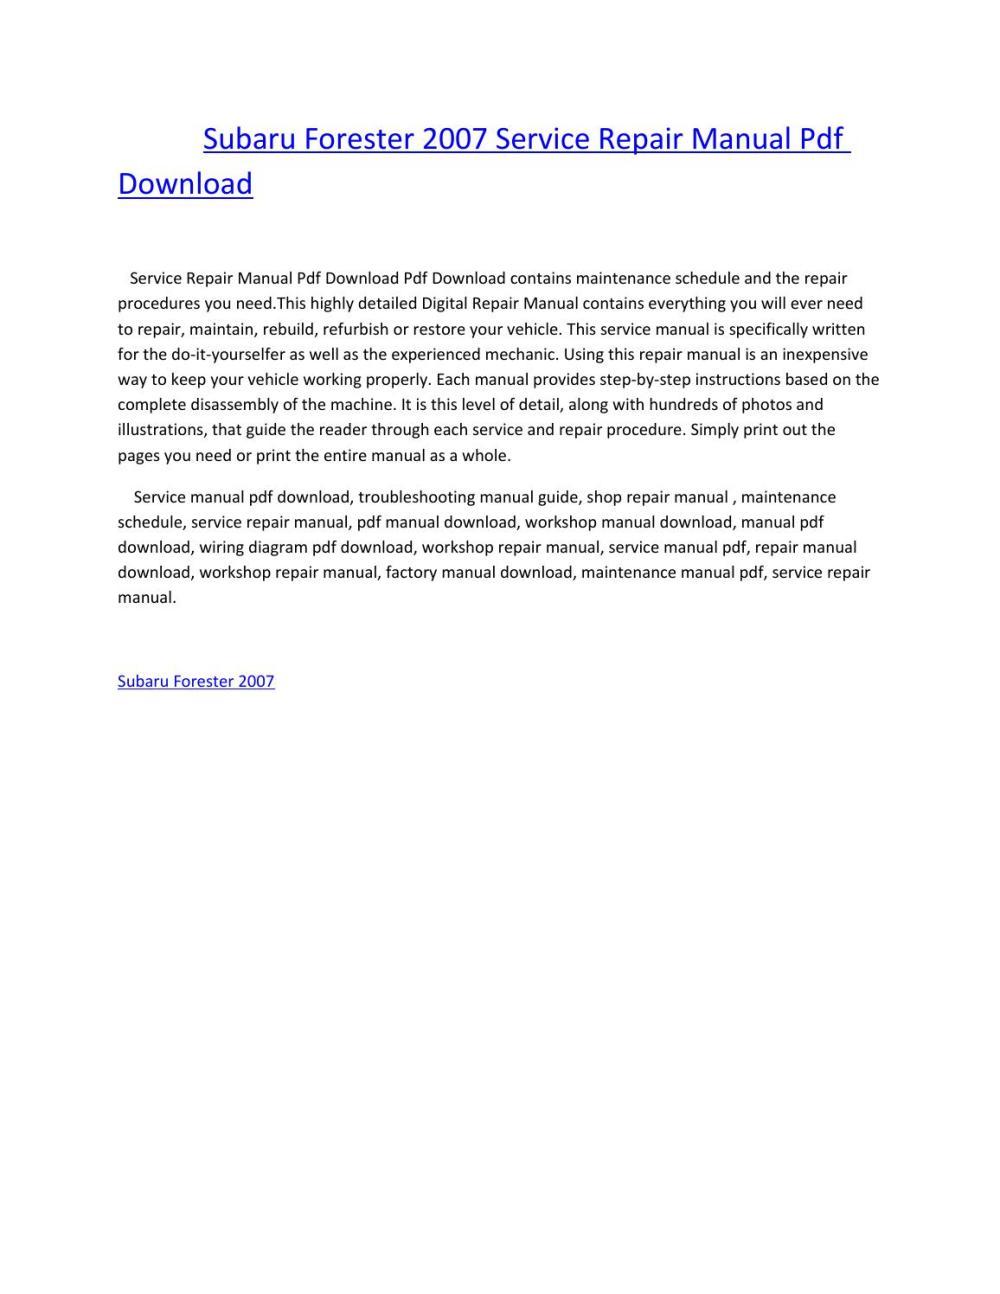 medium resolution of subaru forester 2007 service repair manual pdf download by amurgului issuu